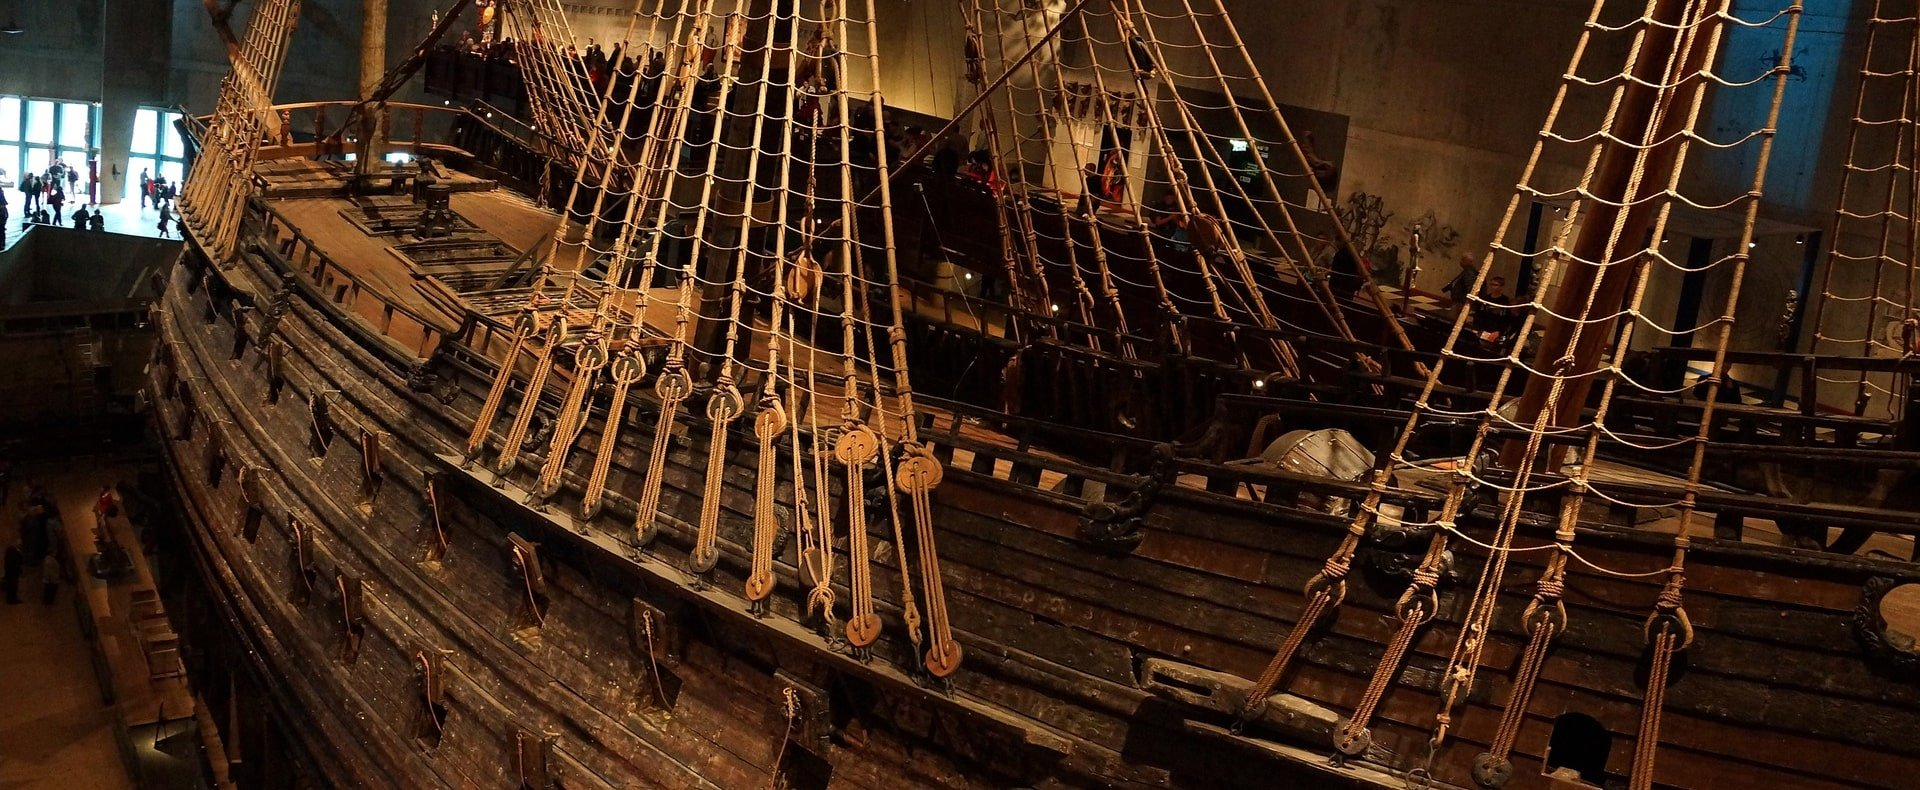 Vasa Museum, Stockholm Gallery